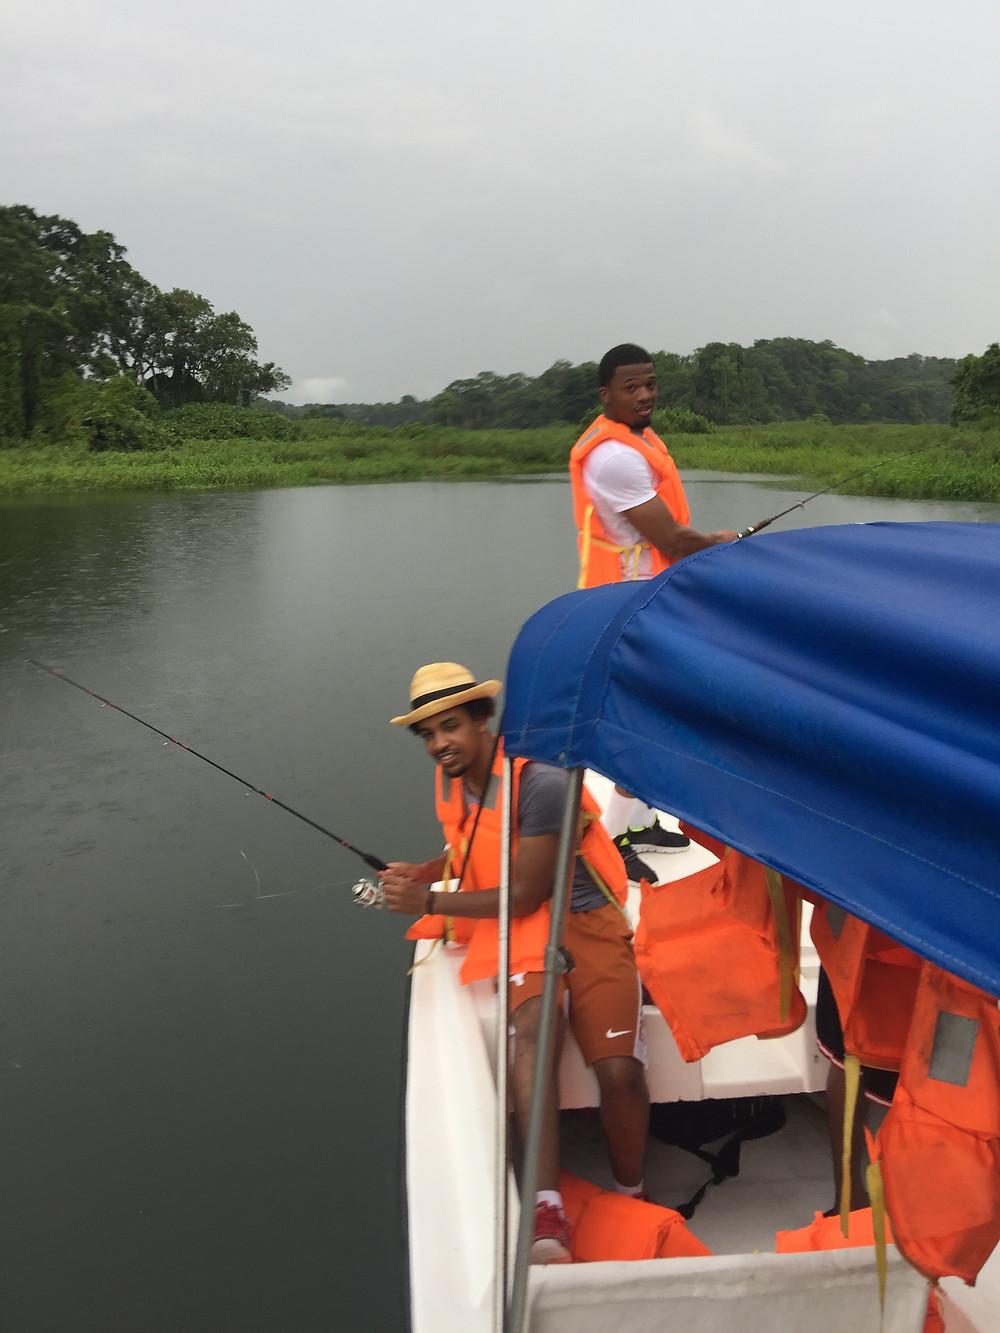 Sargento Bass Fishing in Panama